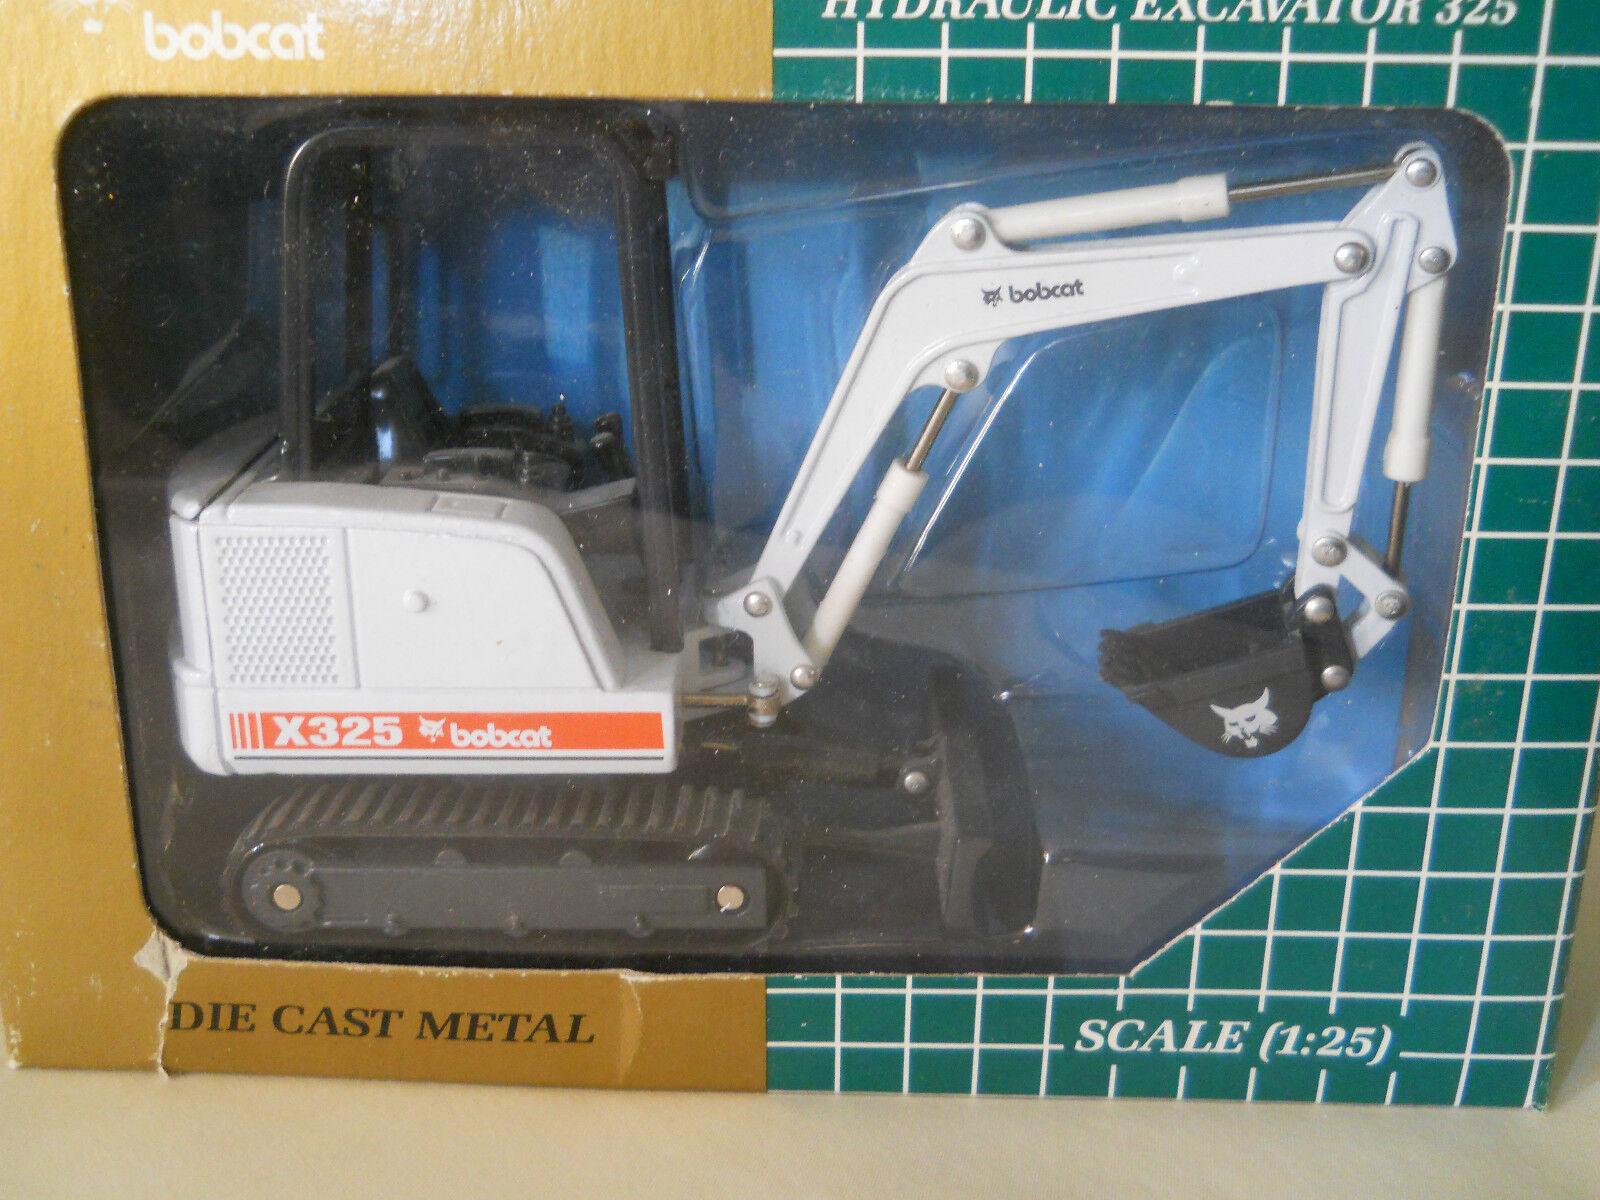 Bobcat X325 Hydraulic Excavator 325 1 25